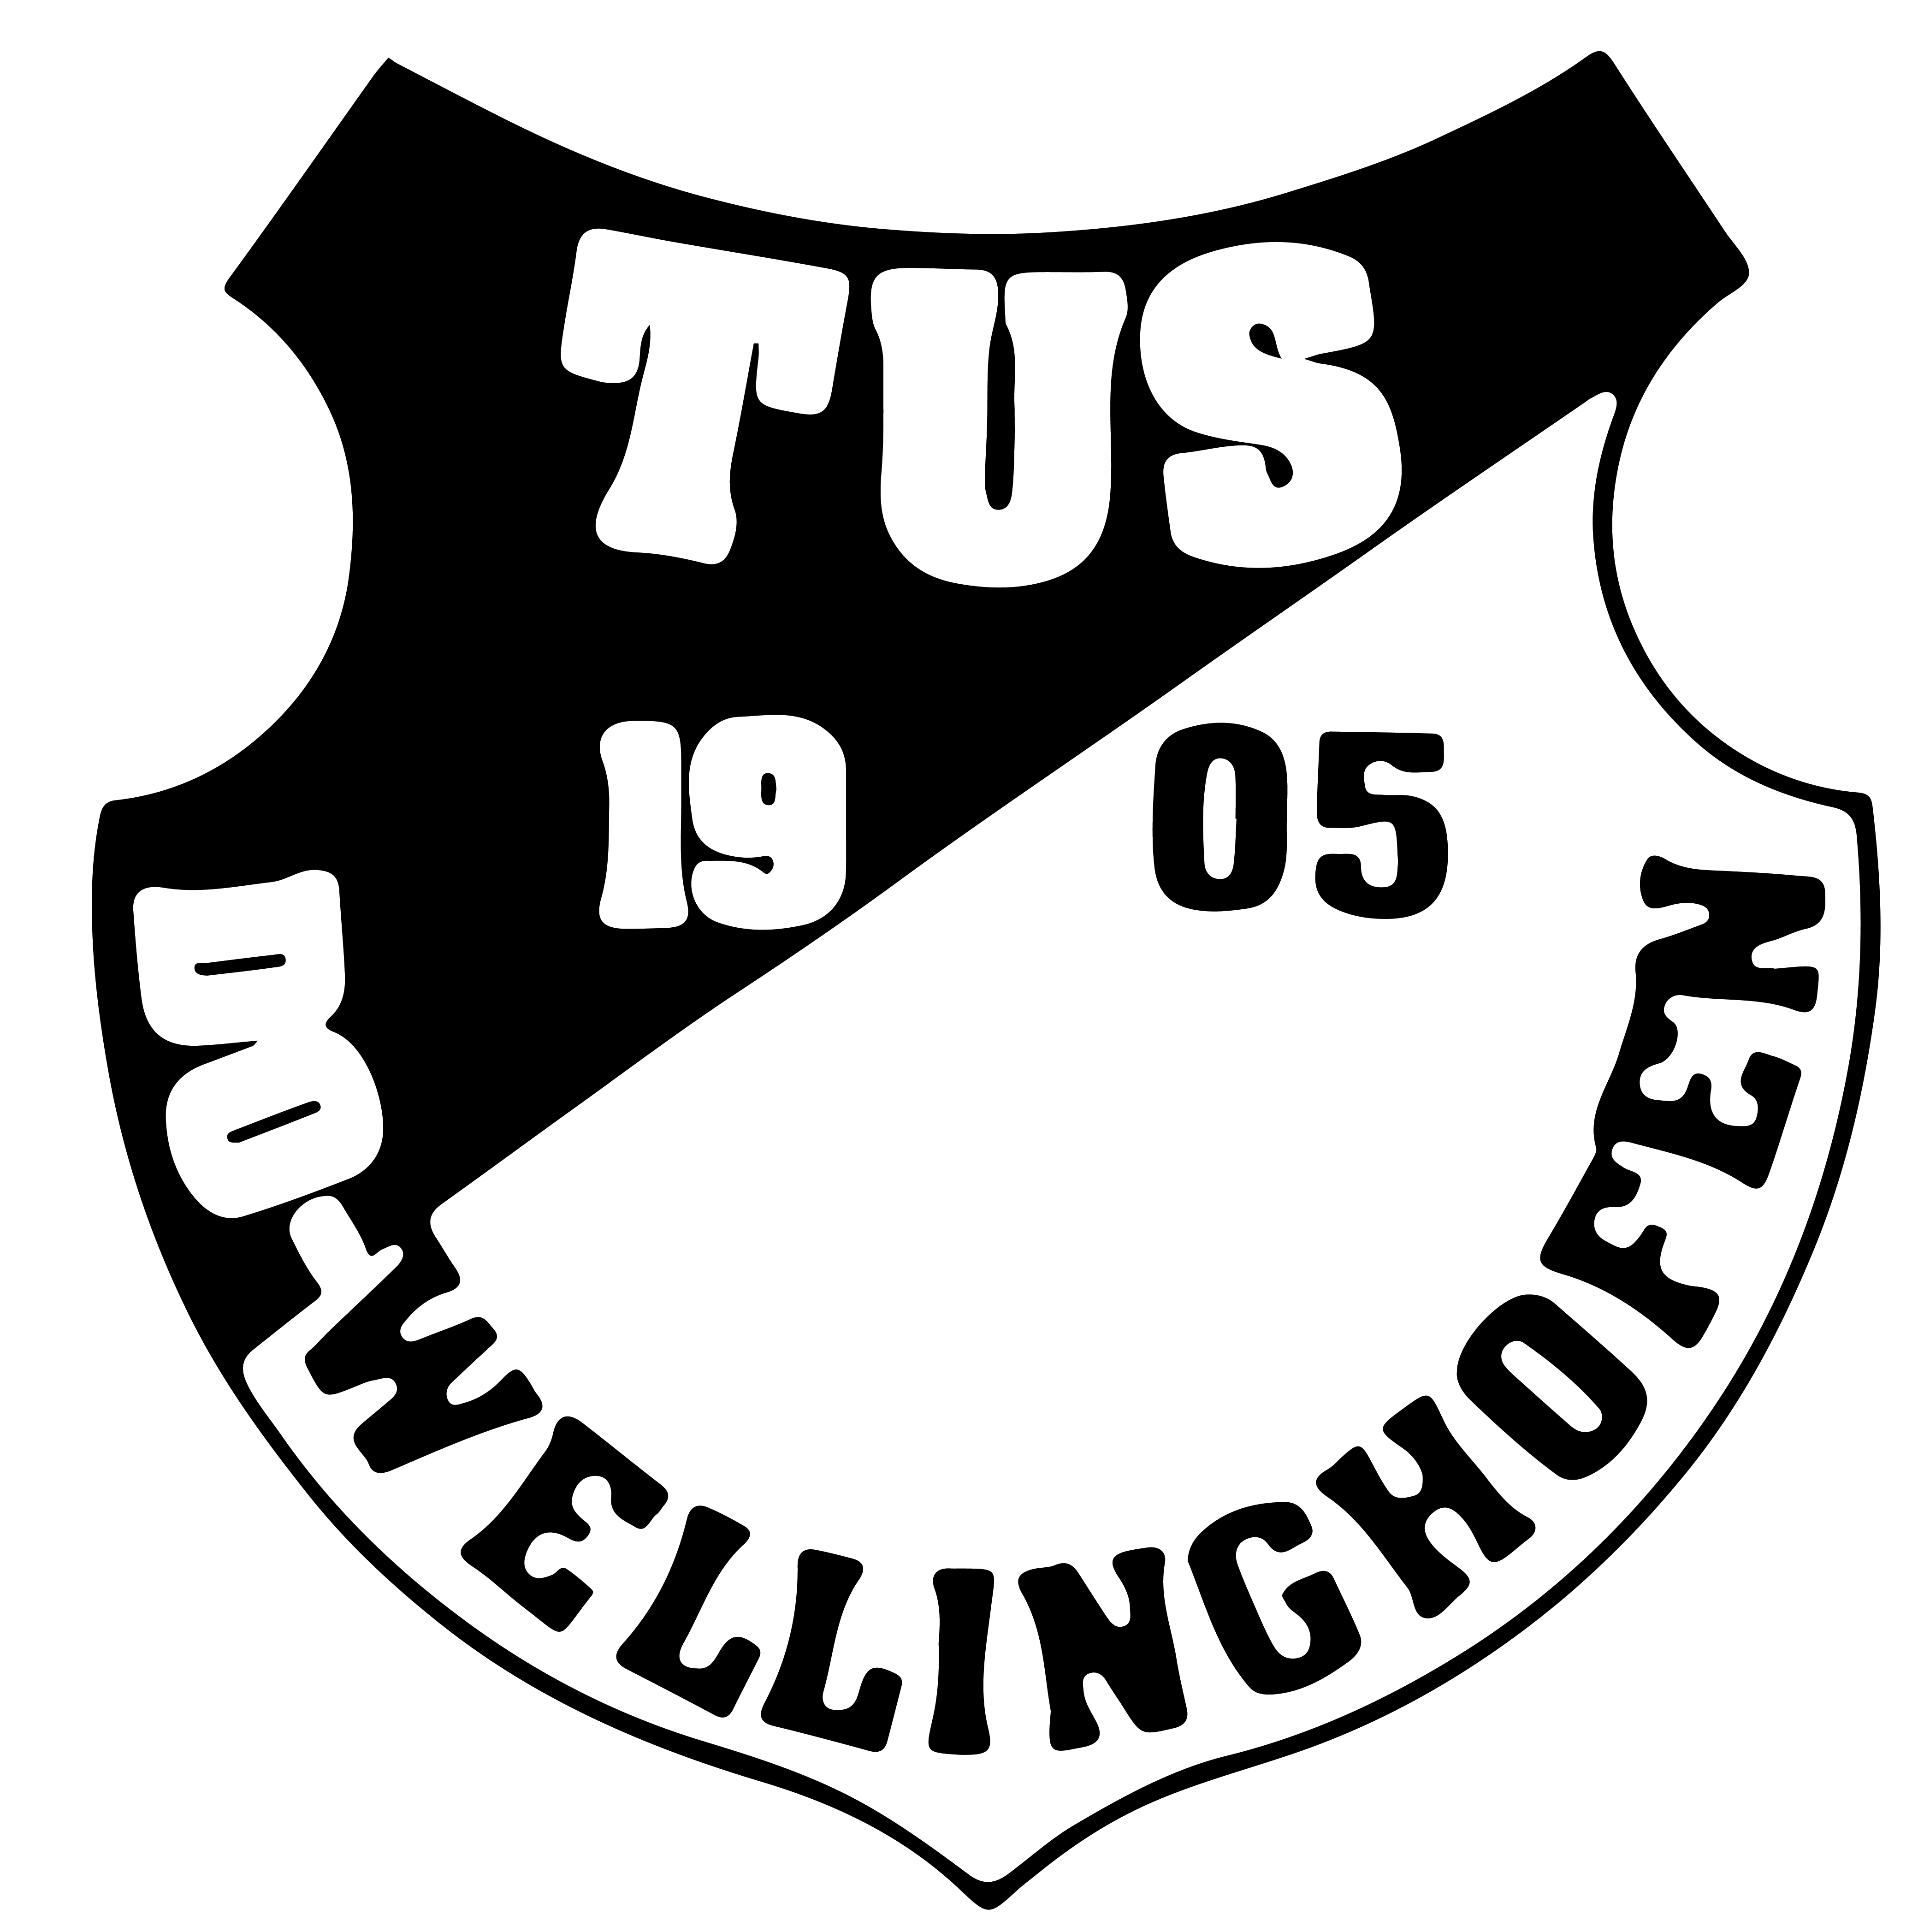 TuS Dortmund-Wellinghofen 1905 e.V.